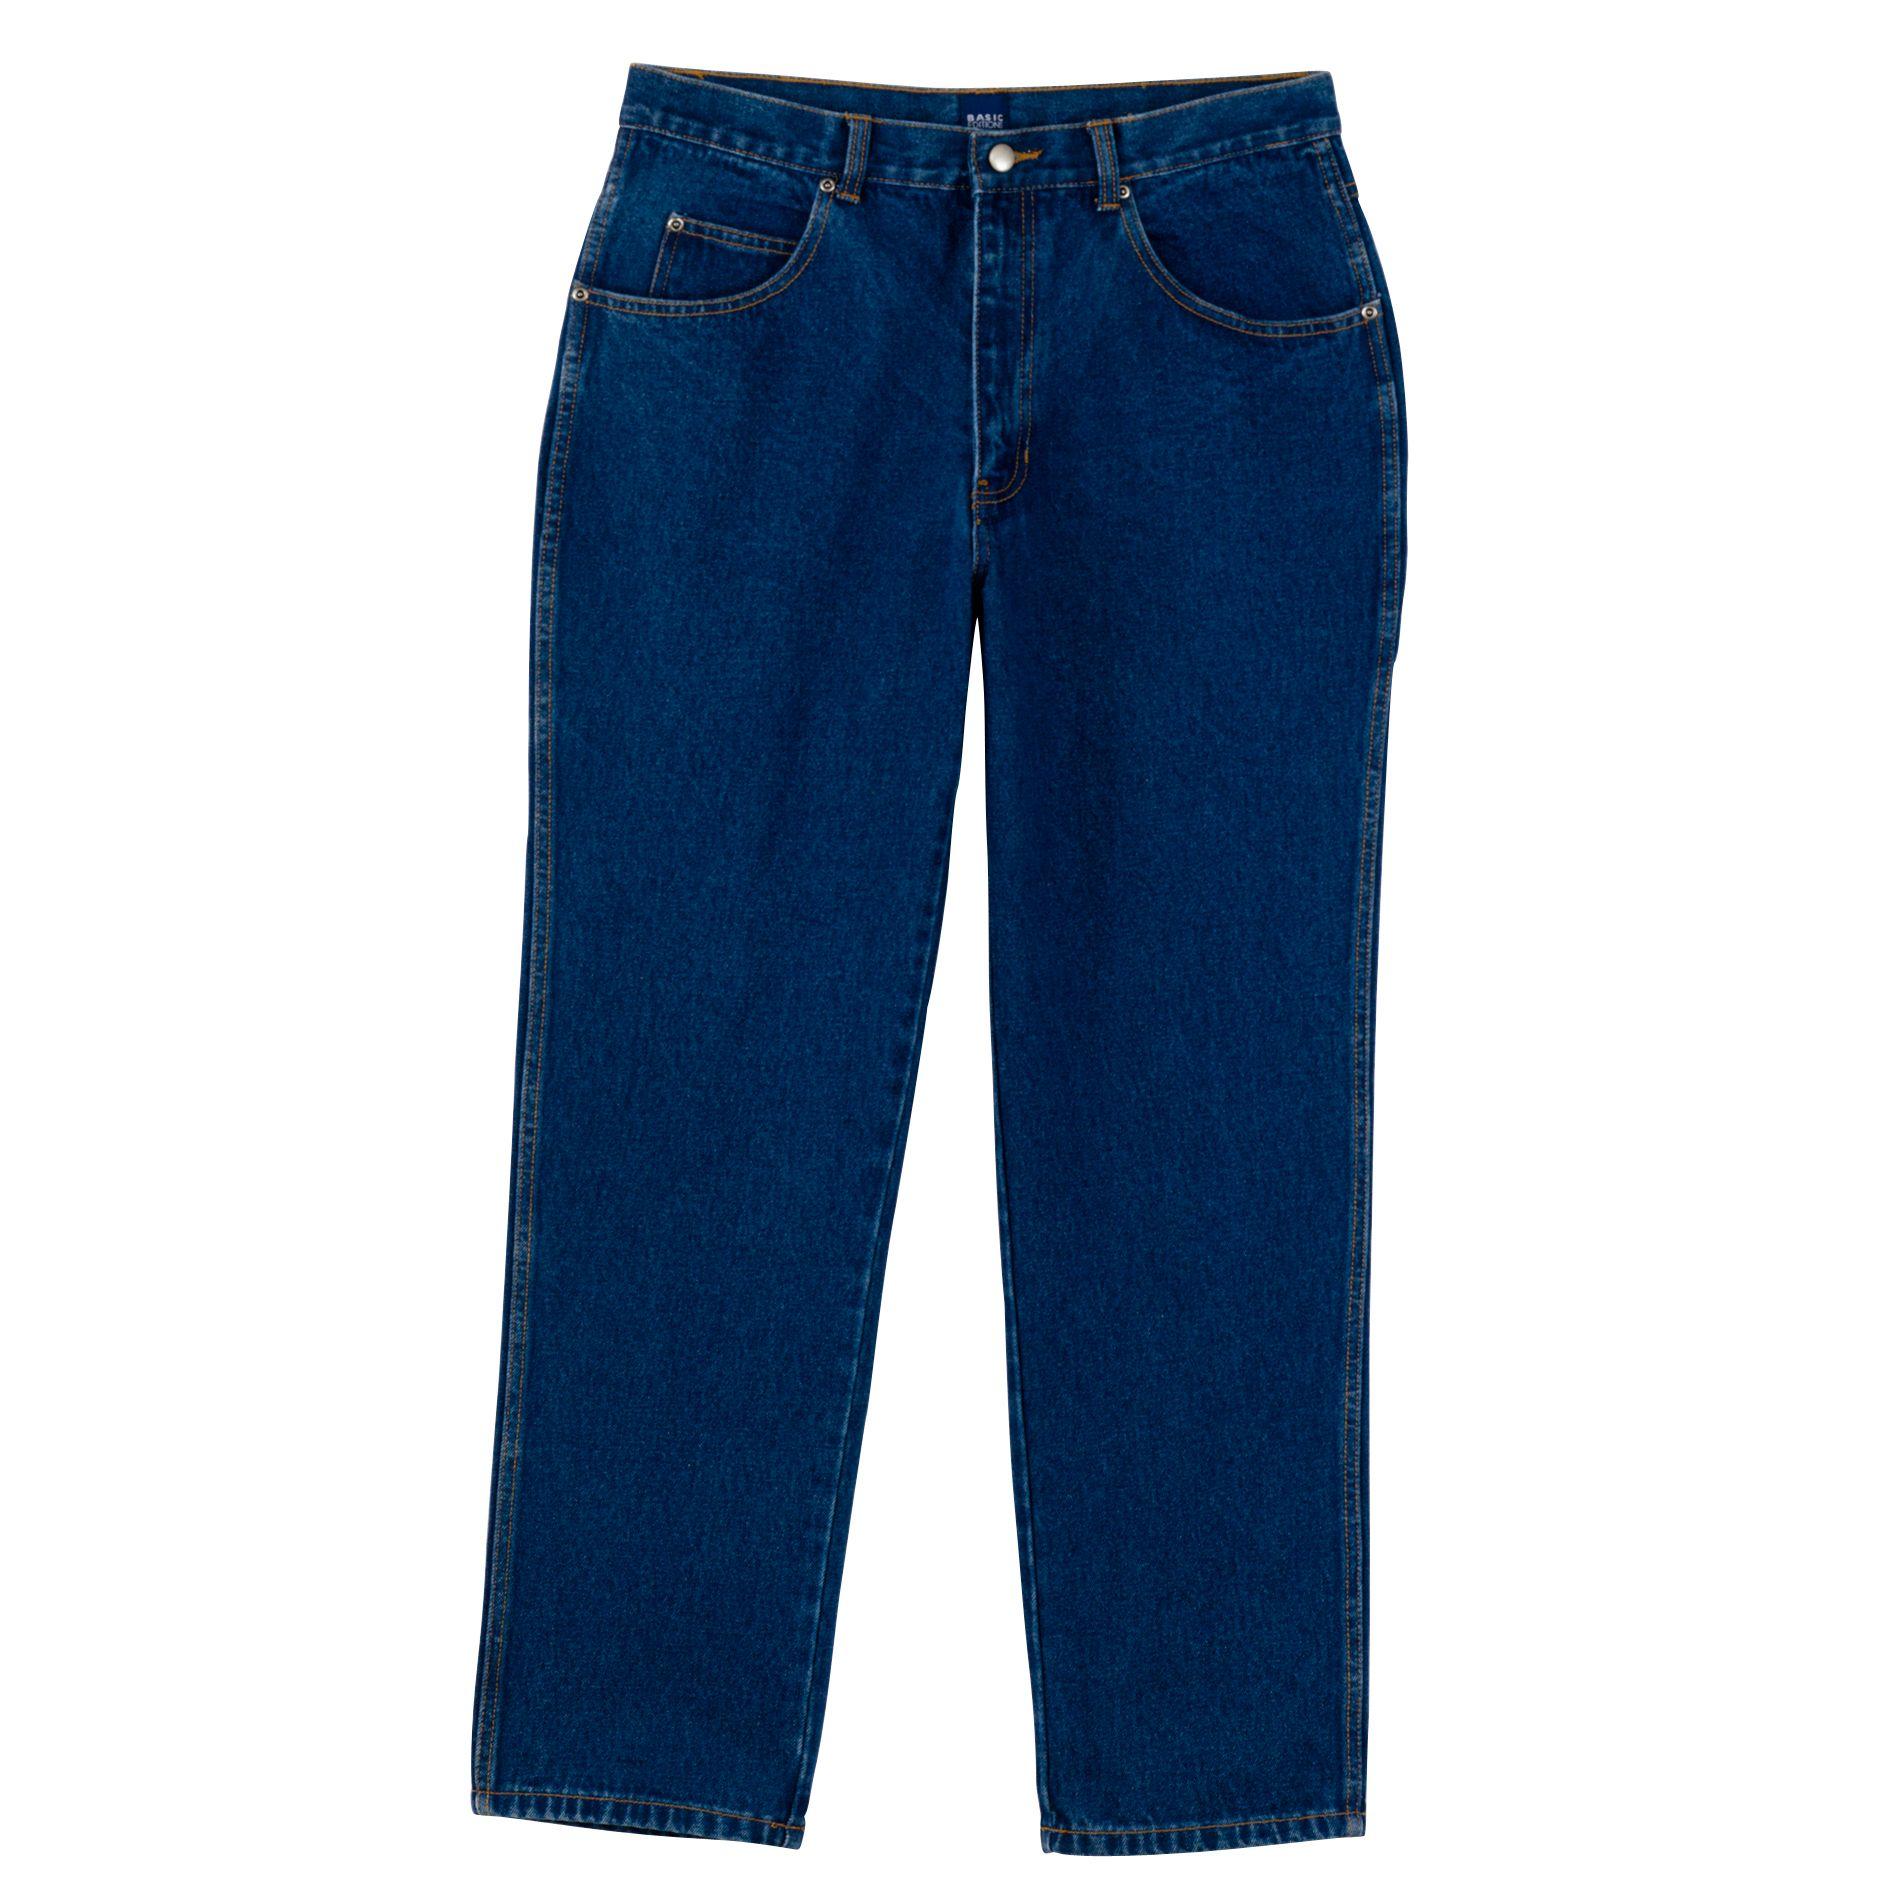 Free cliparts download clip. Clipart pants mens pants